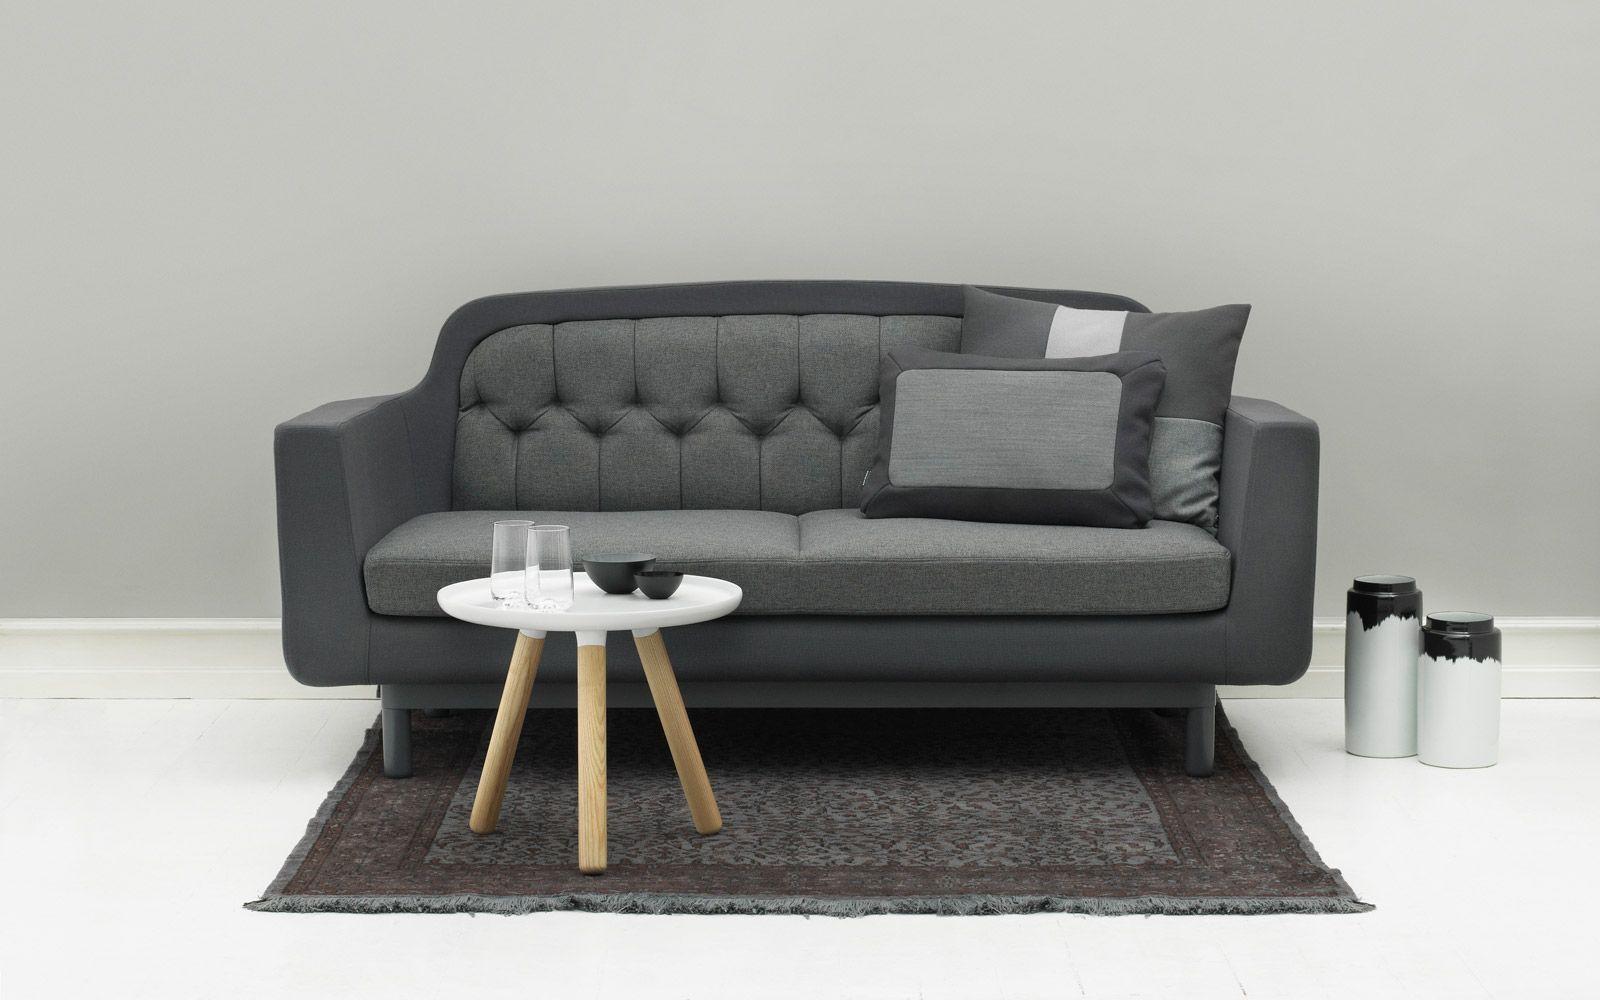 Sofa Kopenhagen norman kopenhagen bukim chims s signature